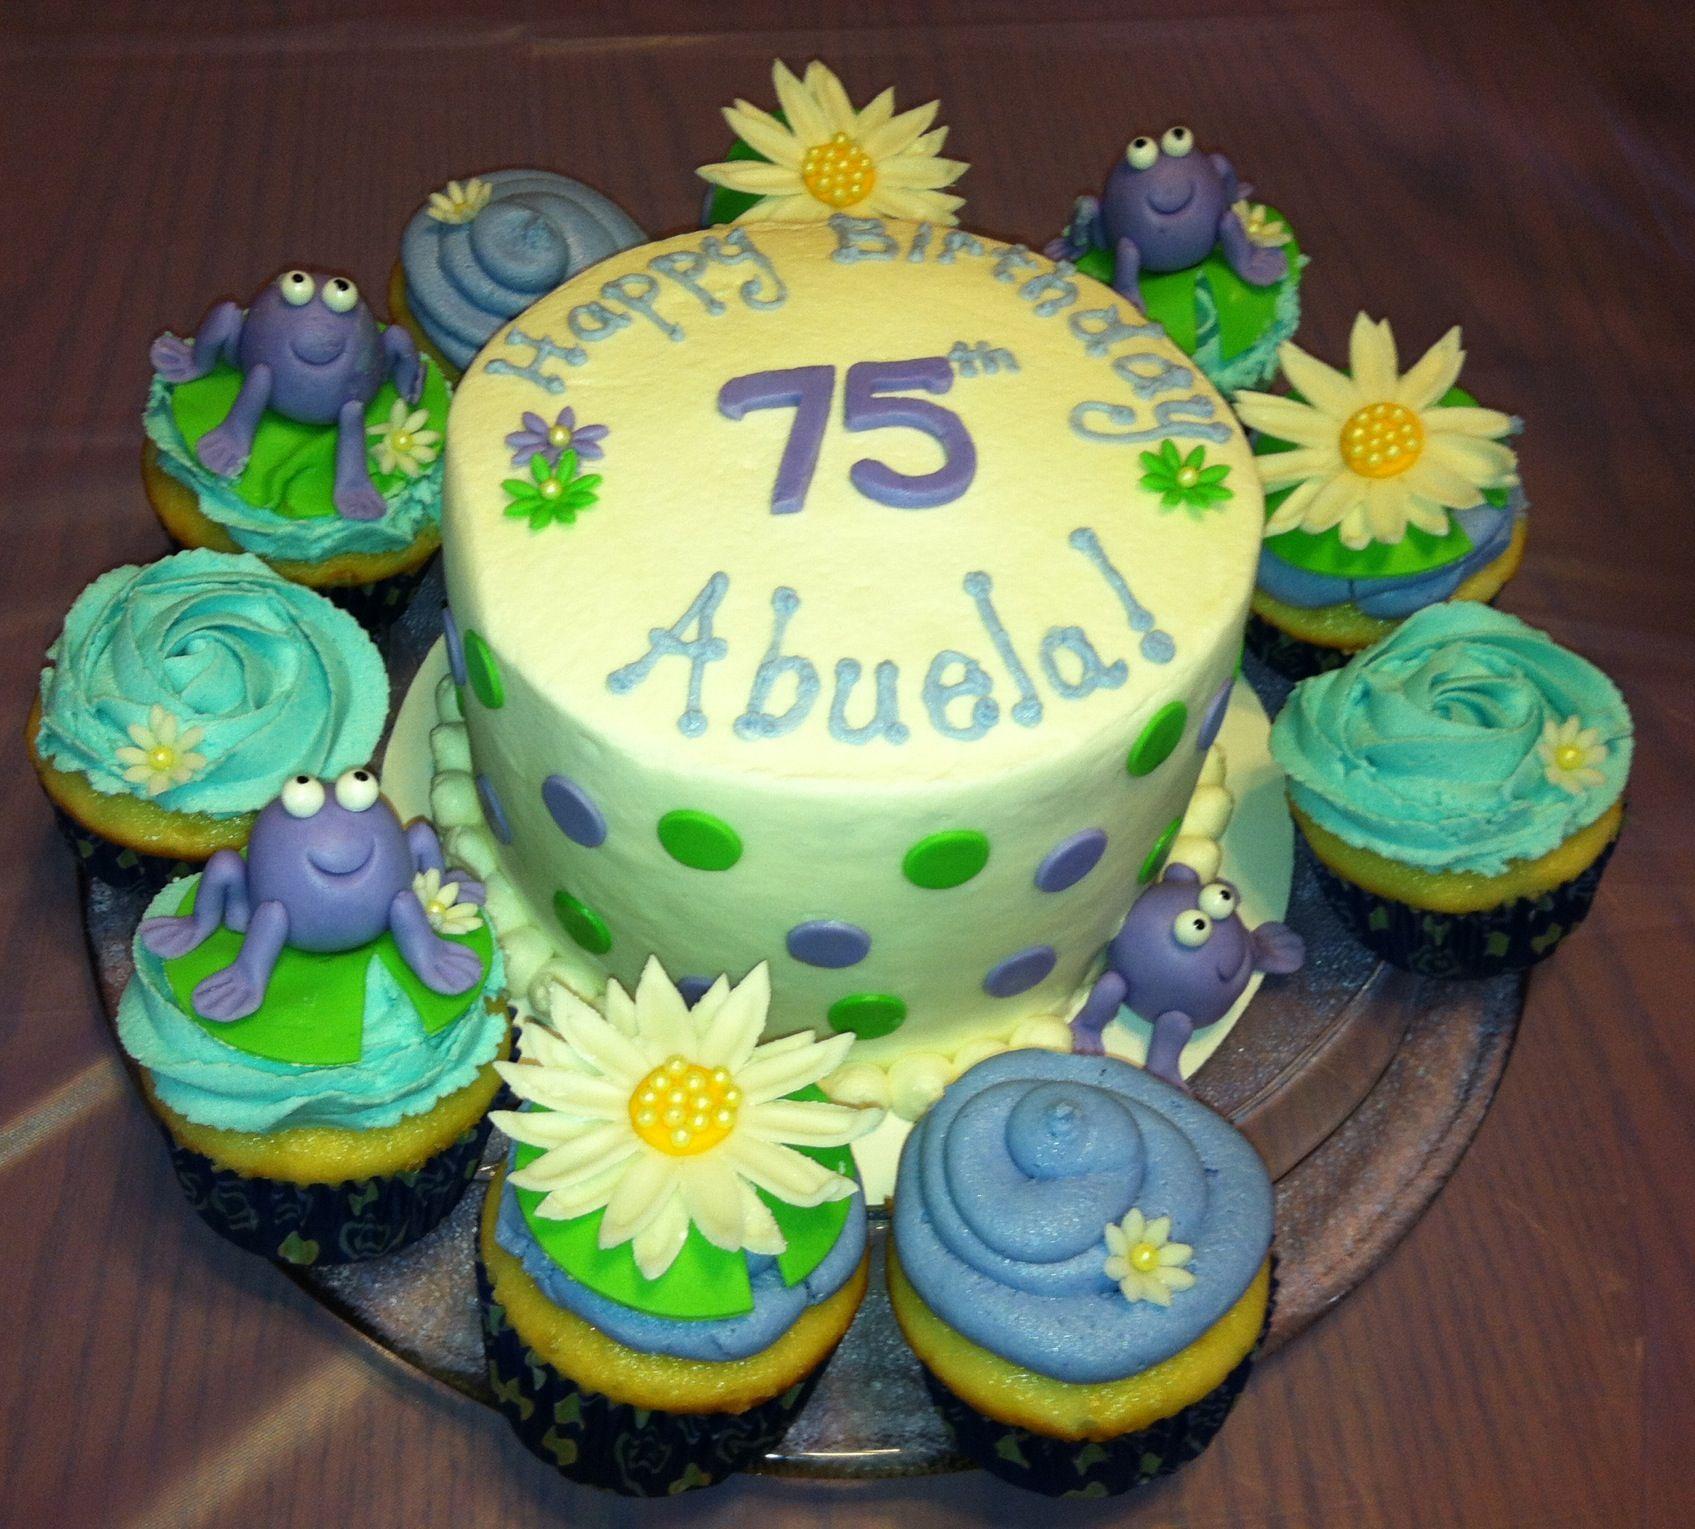 Moms 75th birthday cake made by Jayne Jaynes Creations